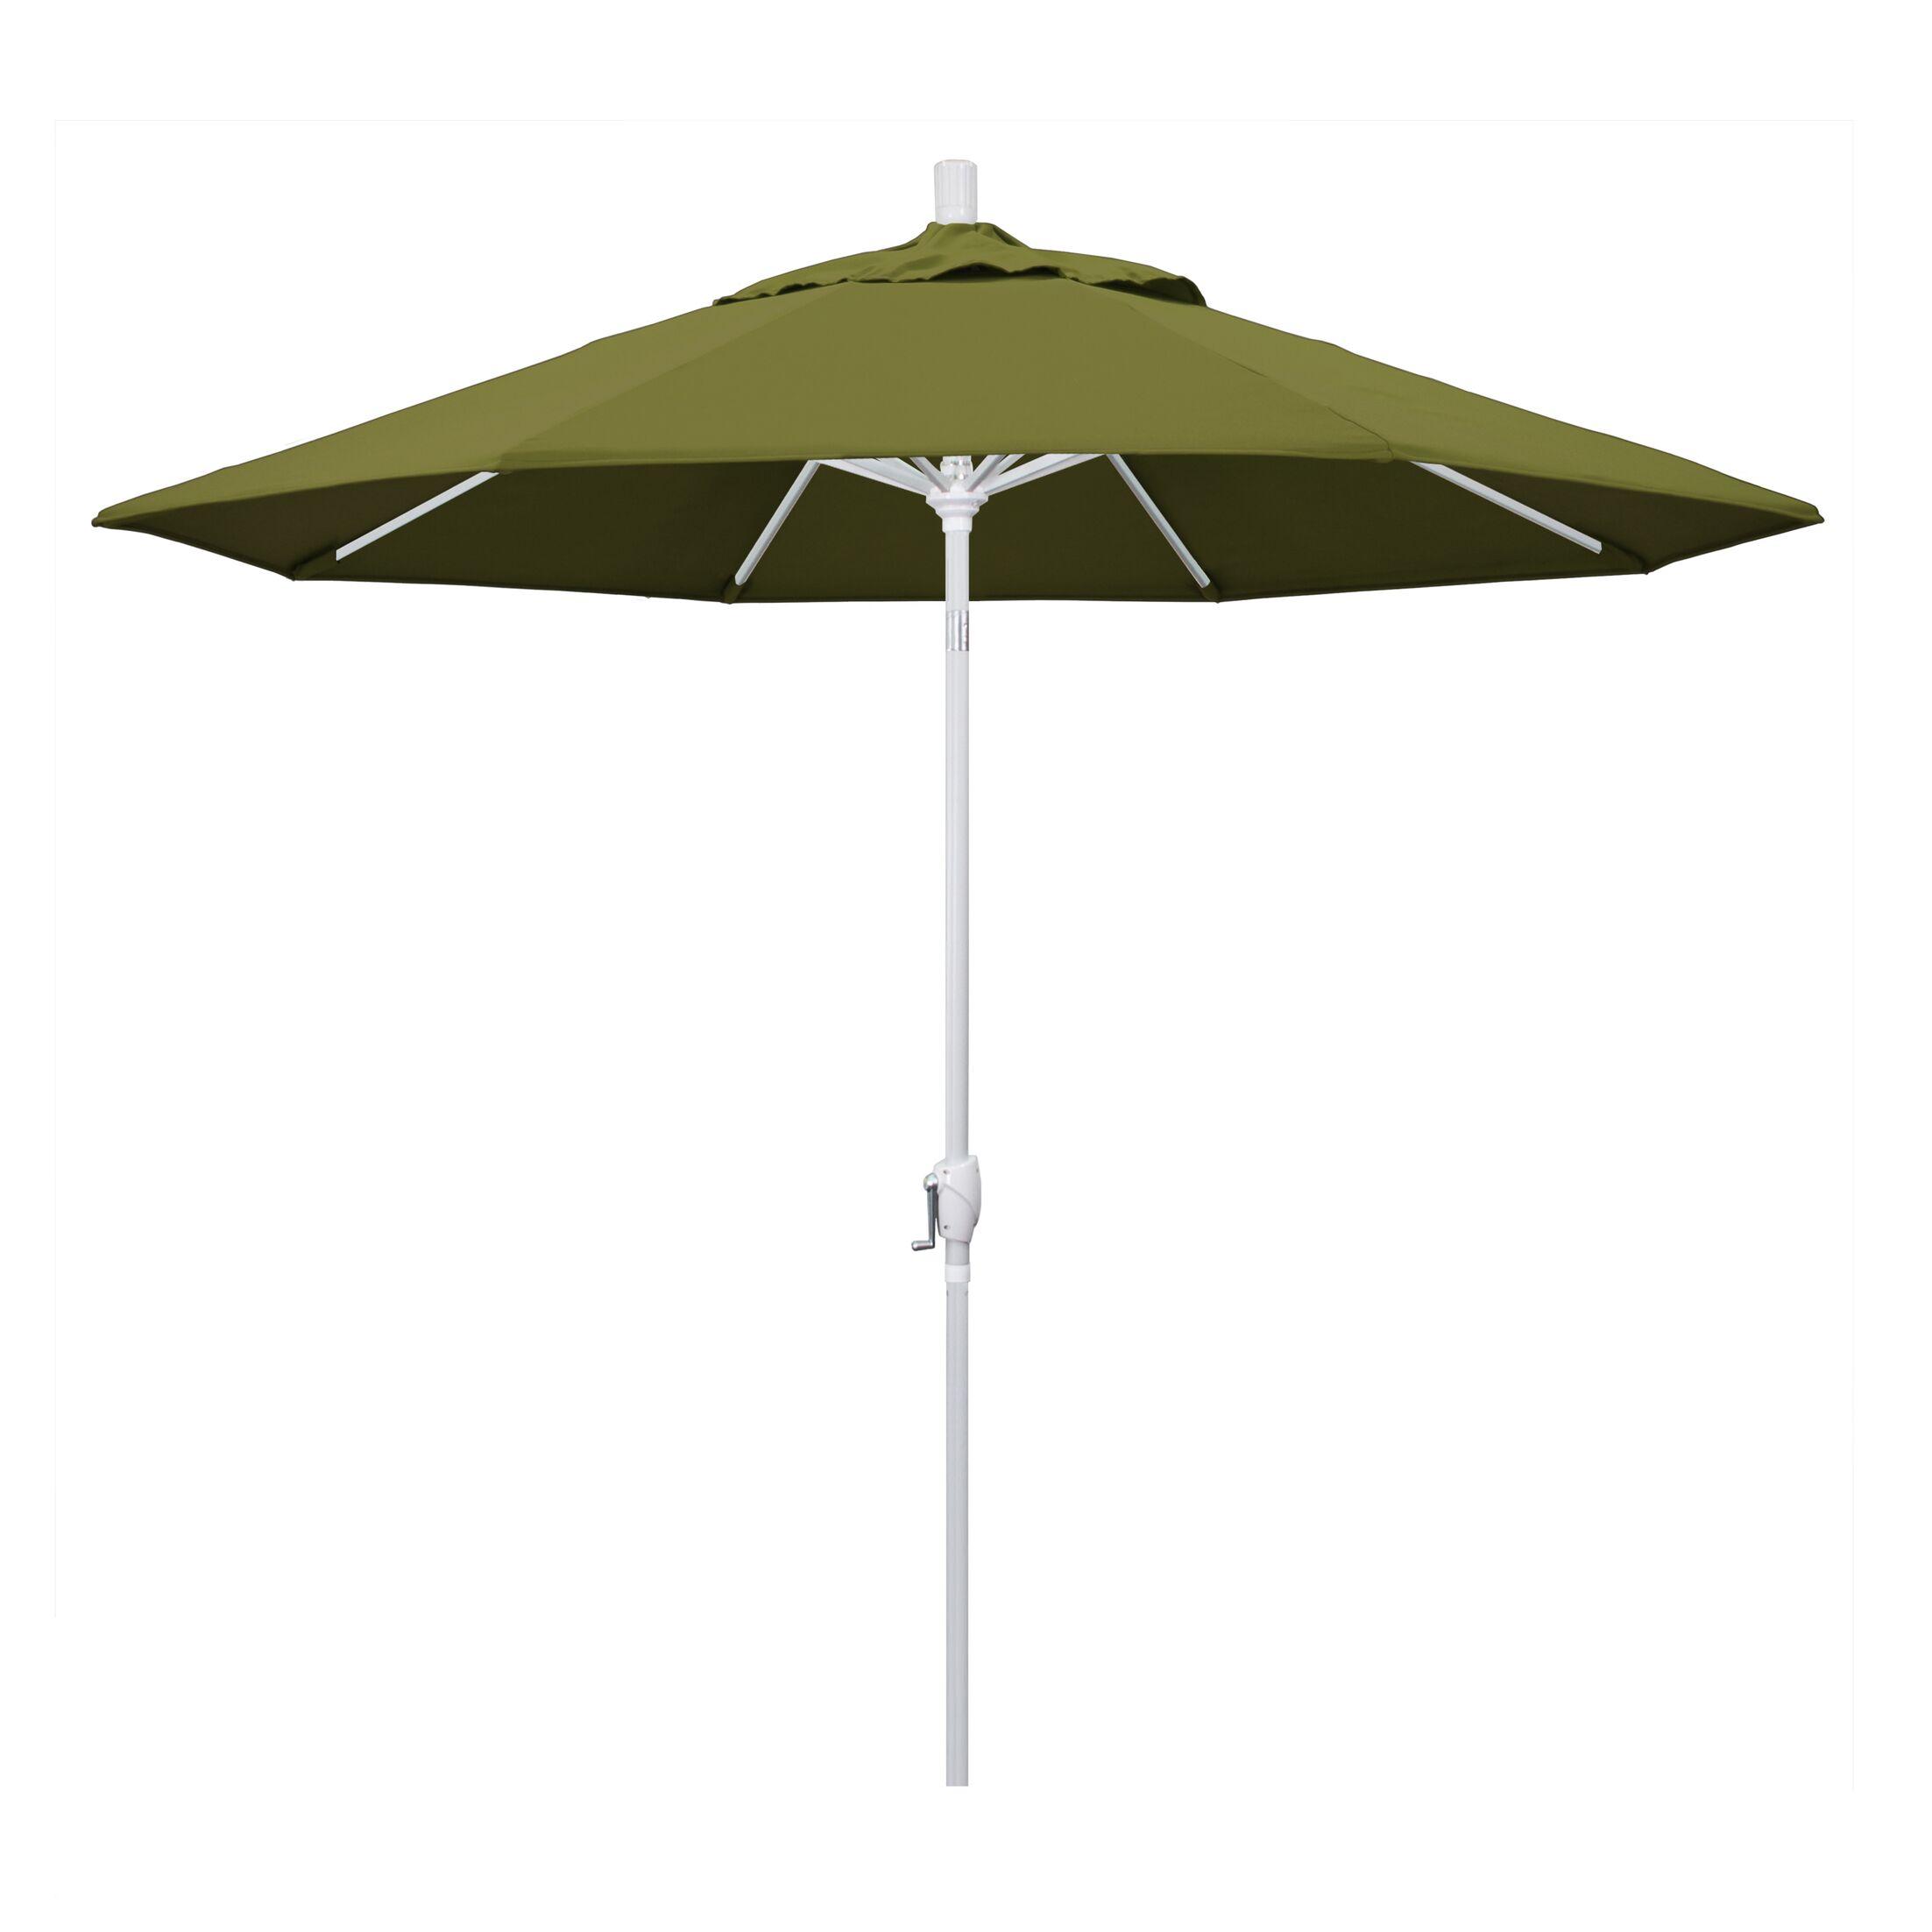 Cello 9' Market Umbrella Fabric: Palm, Frame Finish: Matted White